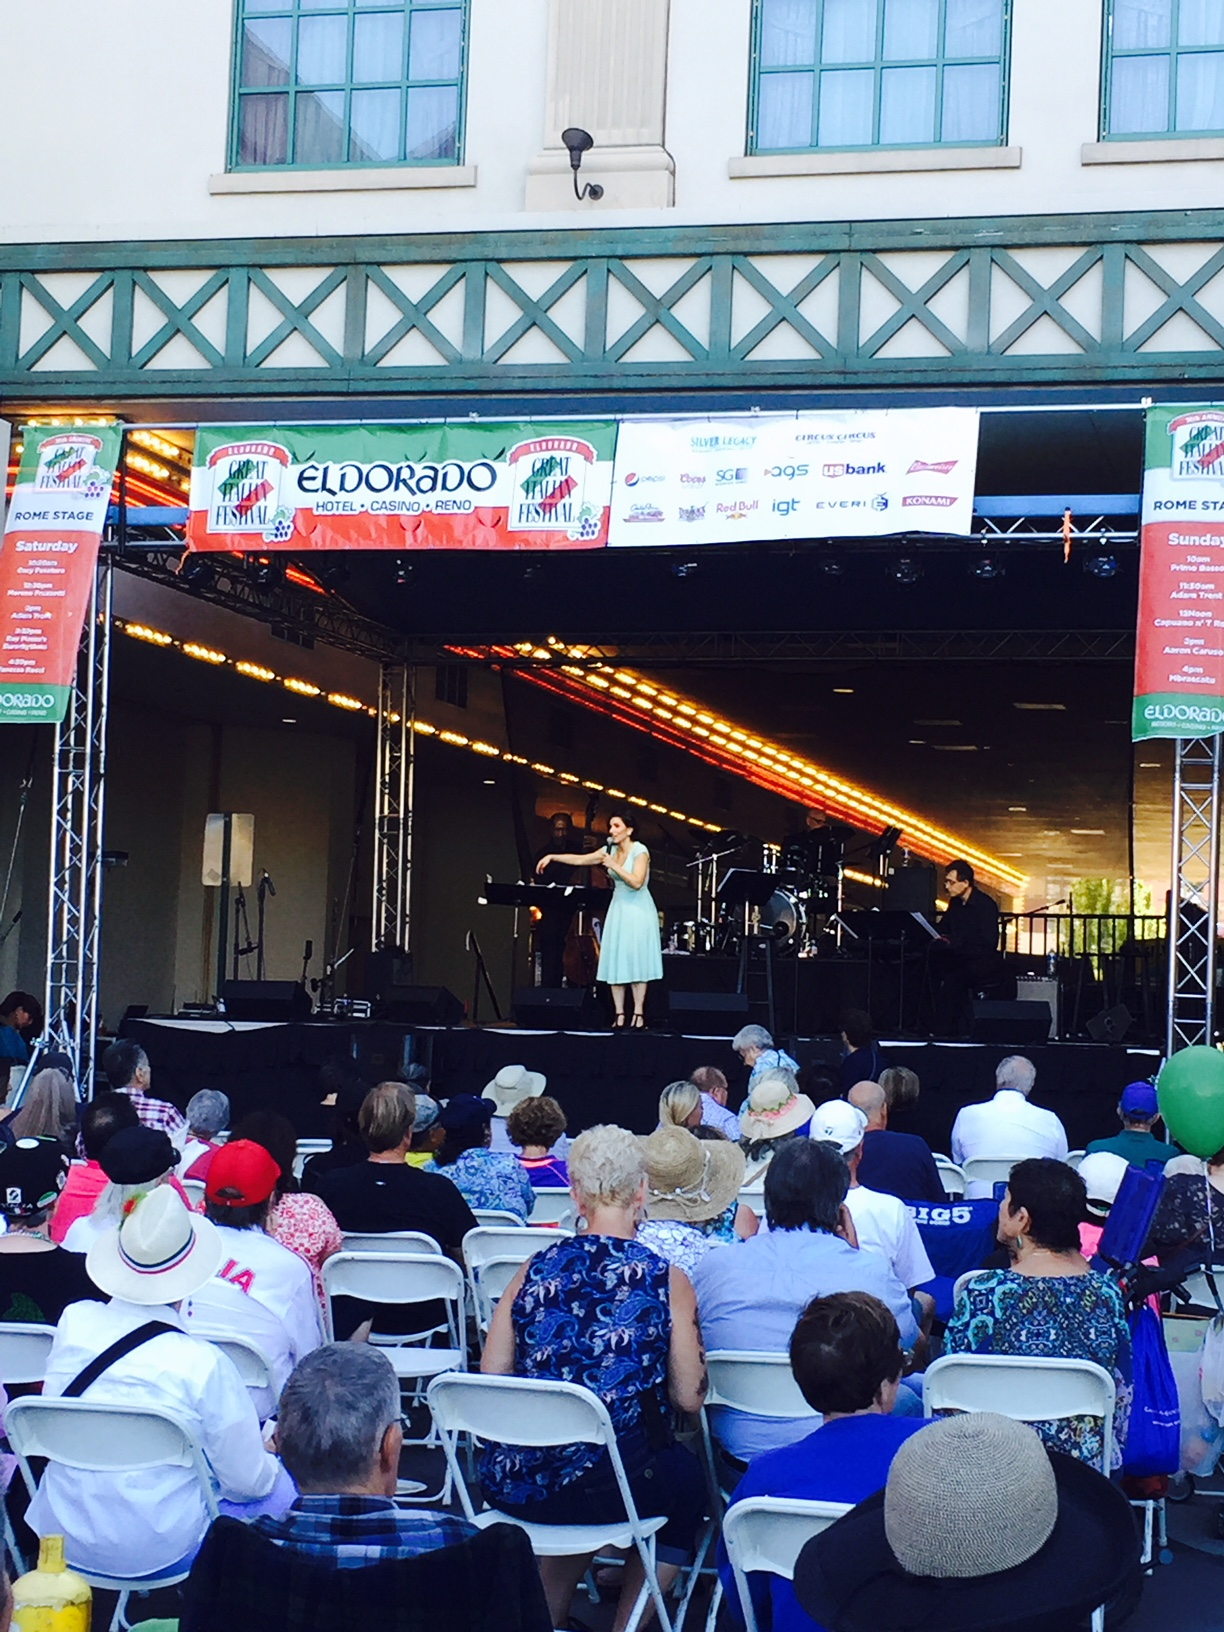 At reno's Great Italian Festival in Nevada.